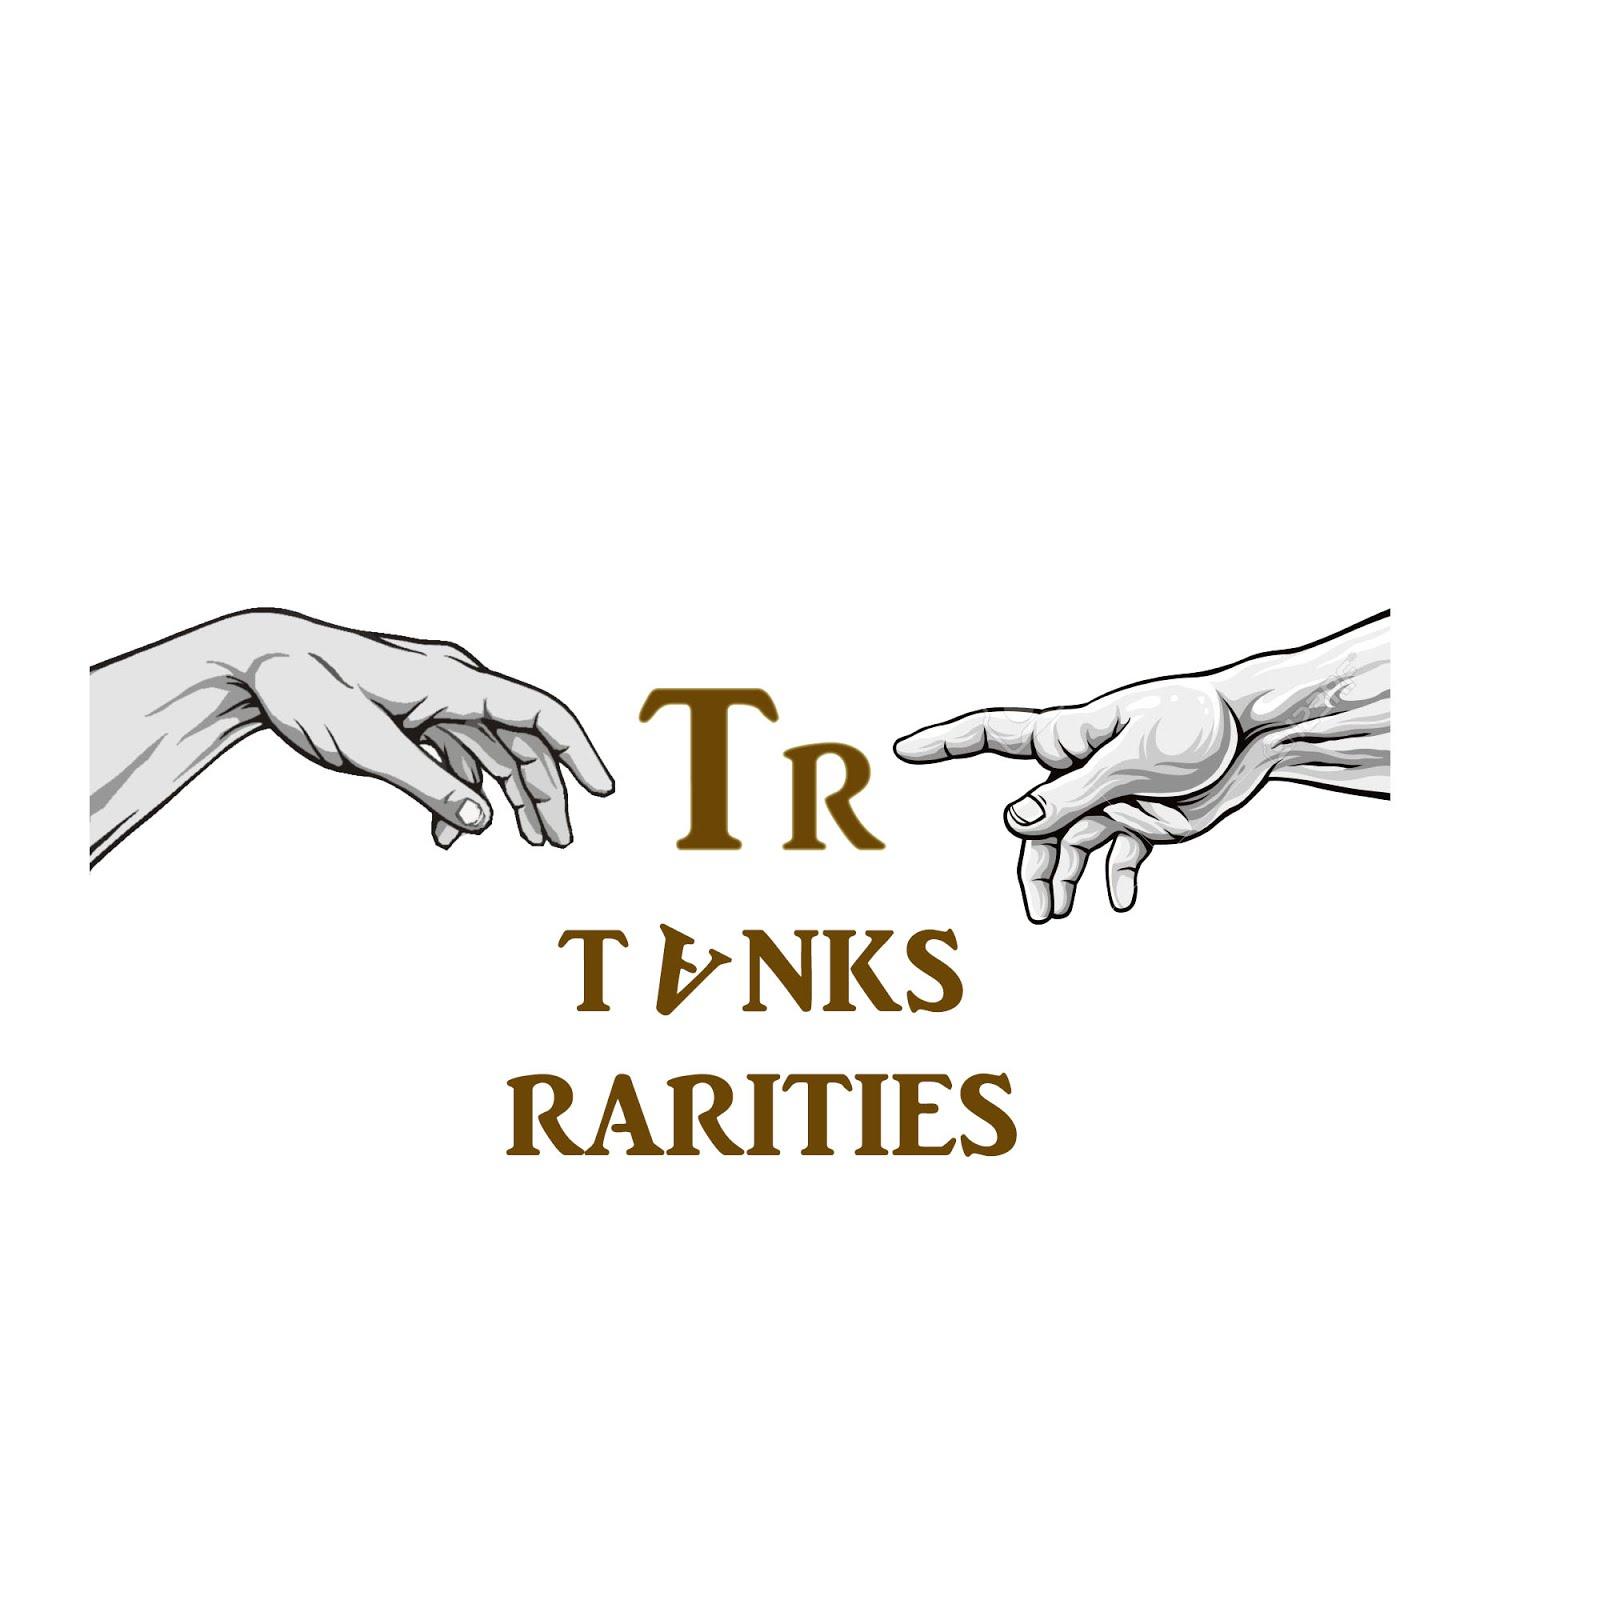 Tanks Rarities